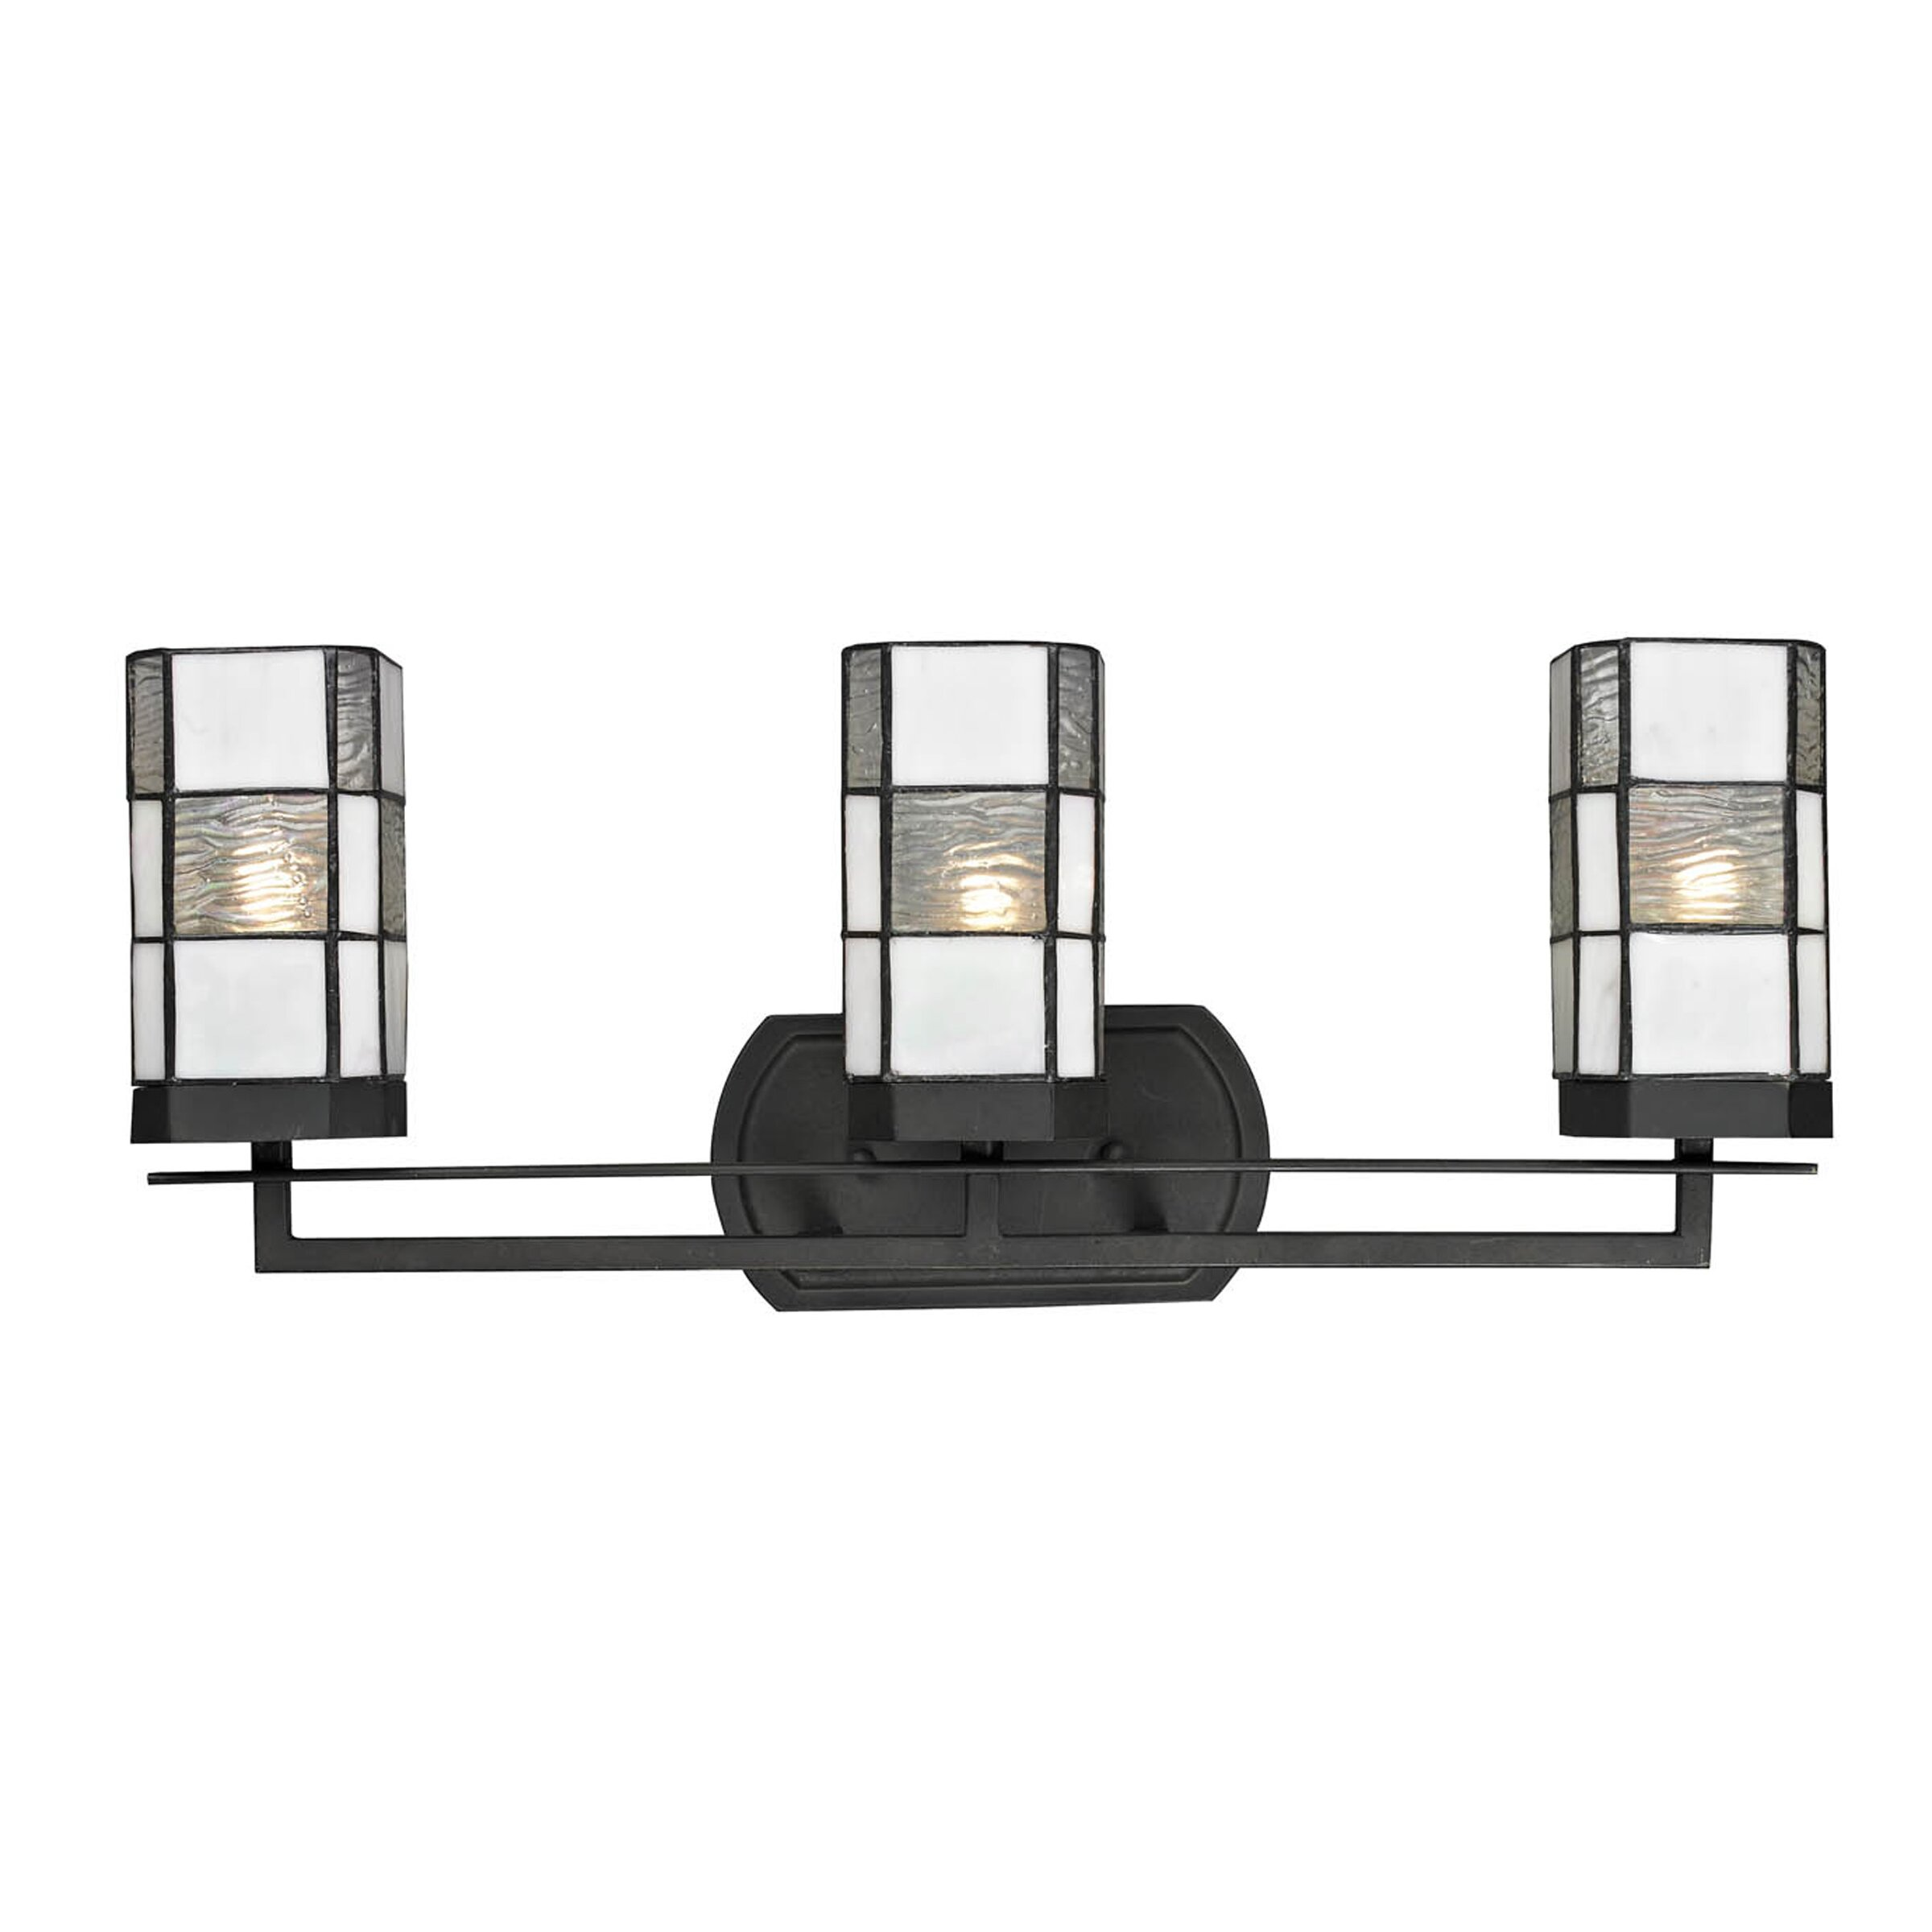 Tiffany Bathroom Lighting: Dale Tiffany Landis 3 Light Bath Vanity Light & Reviews